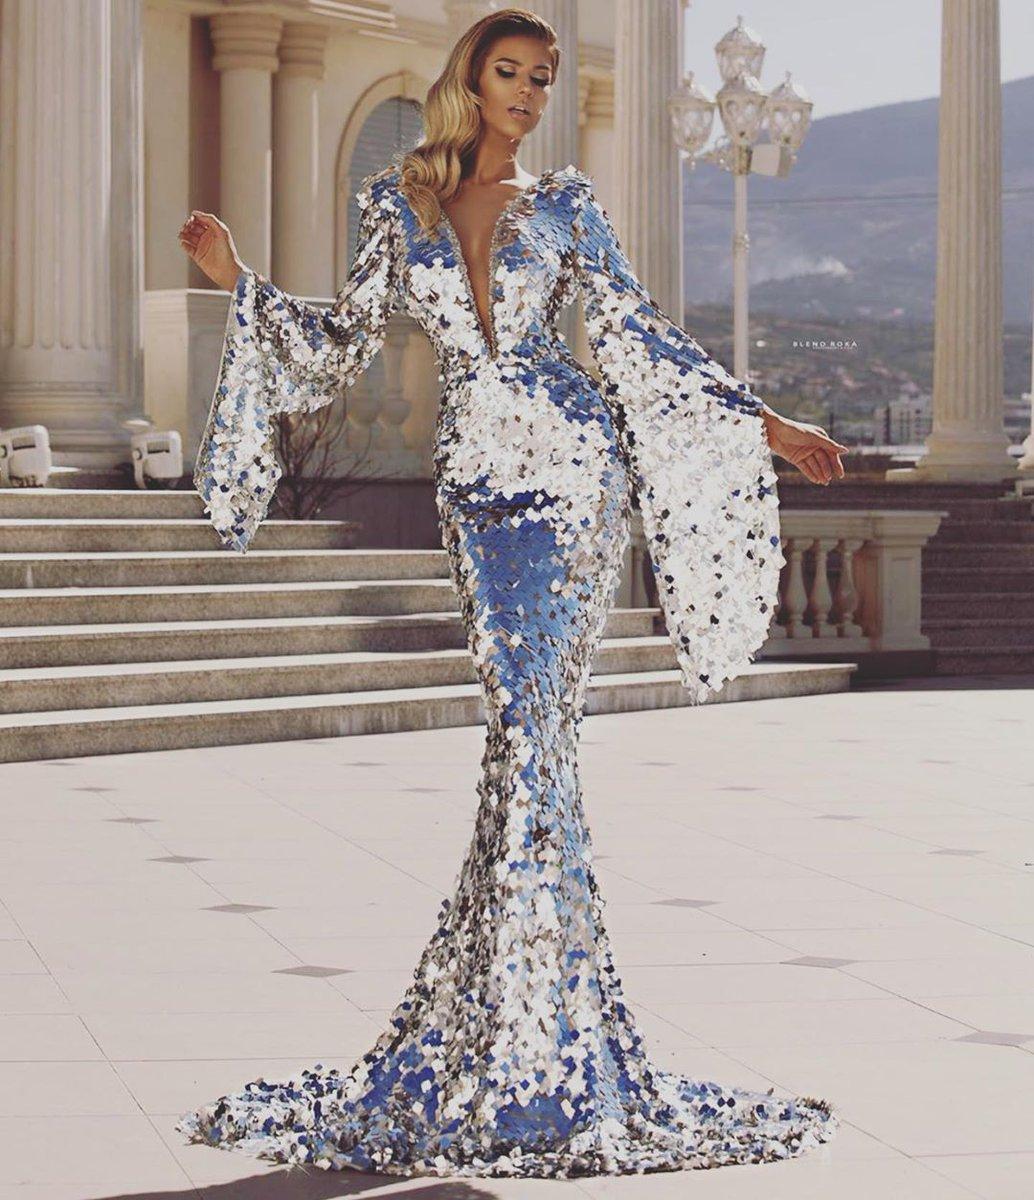 Miss universe Kosovo 2020 . . . #pageant #beautypageant  #dpidmu #sahabatpageant  #missuniverse #instalike #instagood  #instagram #instadaily  #beautypageant #beautyqueen  #missindonesia #missuniverse #queenpic.twitter.com/ORpZkrJWFX  by Pageantinternationall